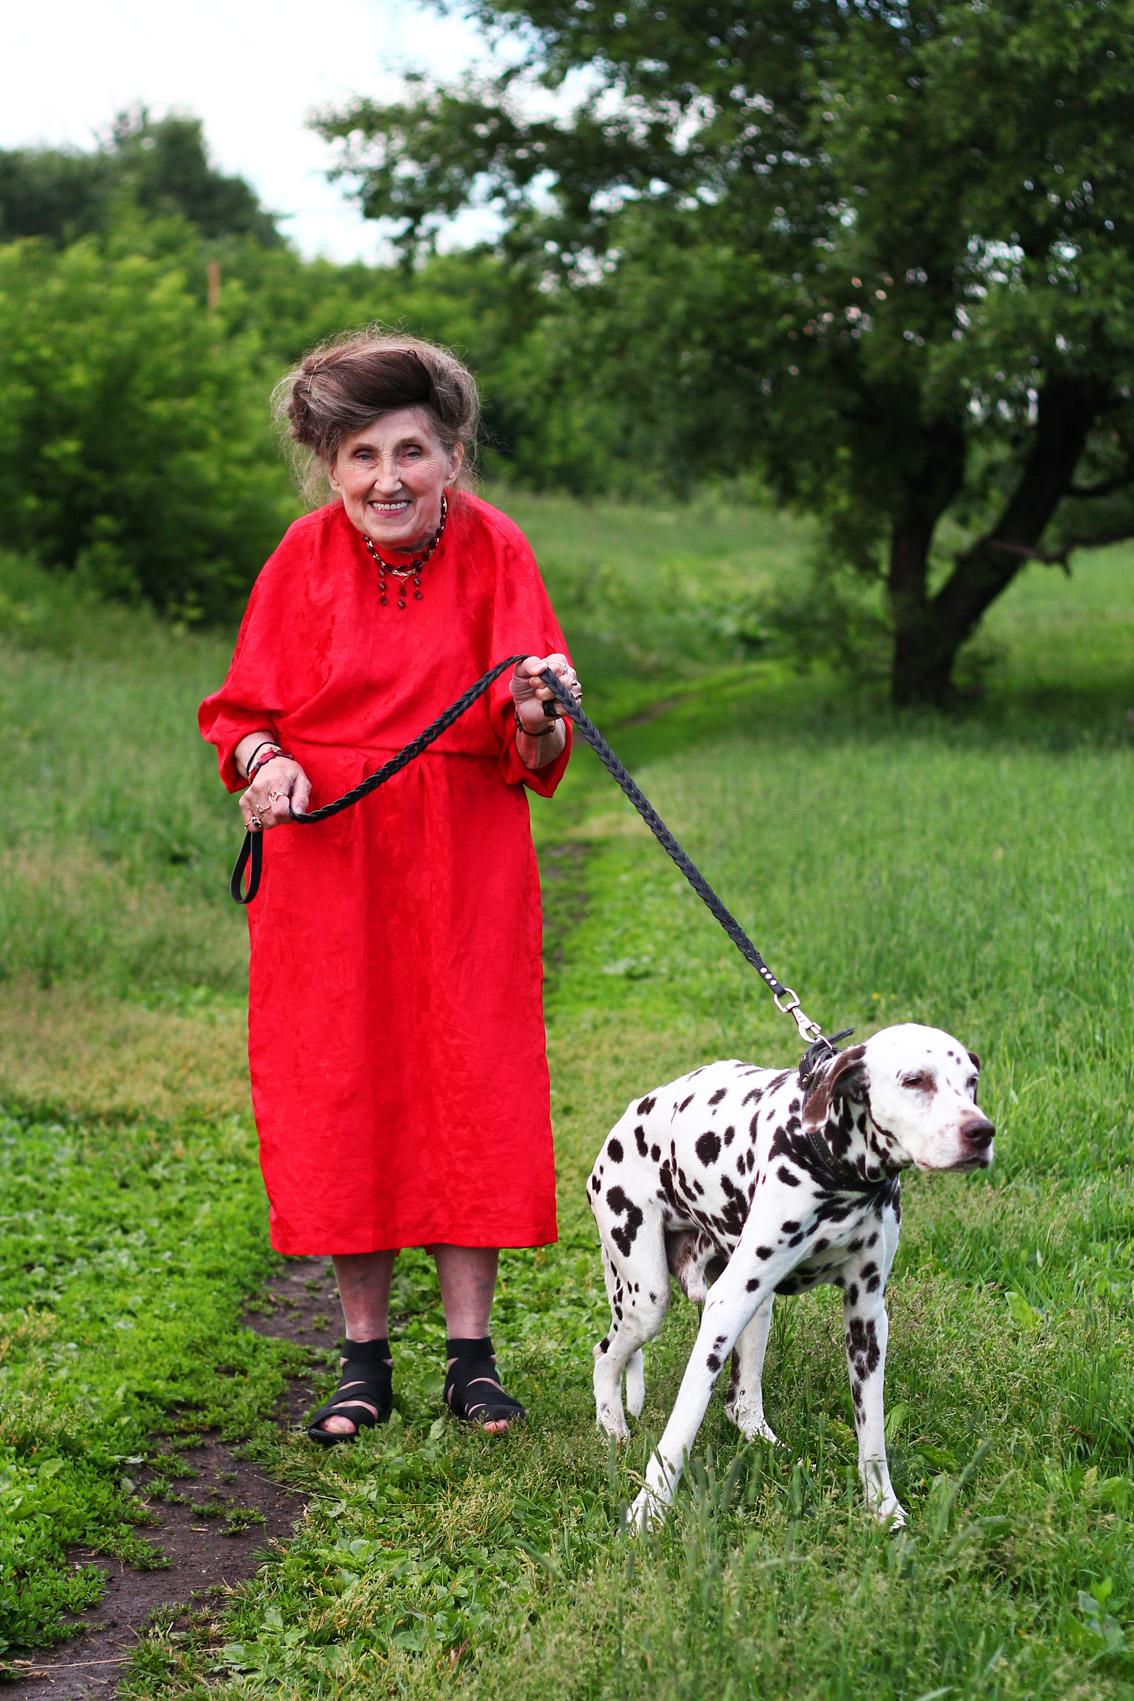 Албина Станиславовна. Снимка: Игор Гавар